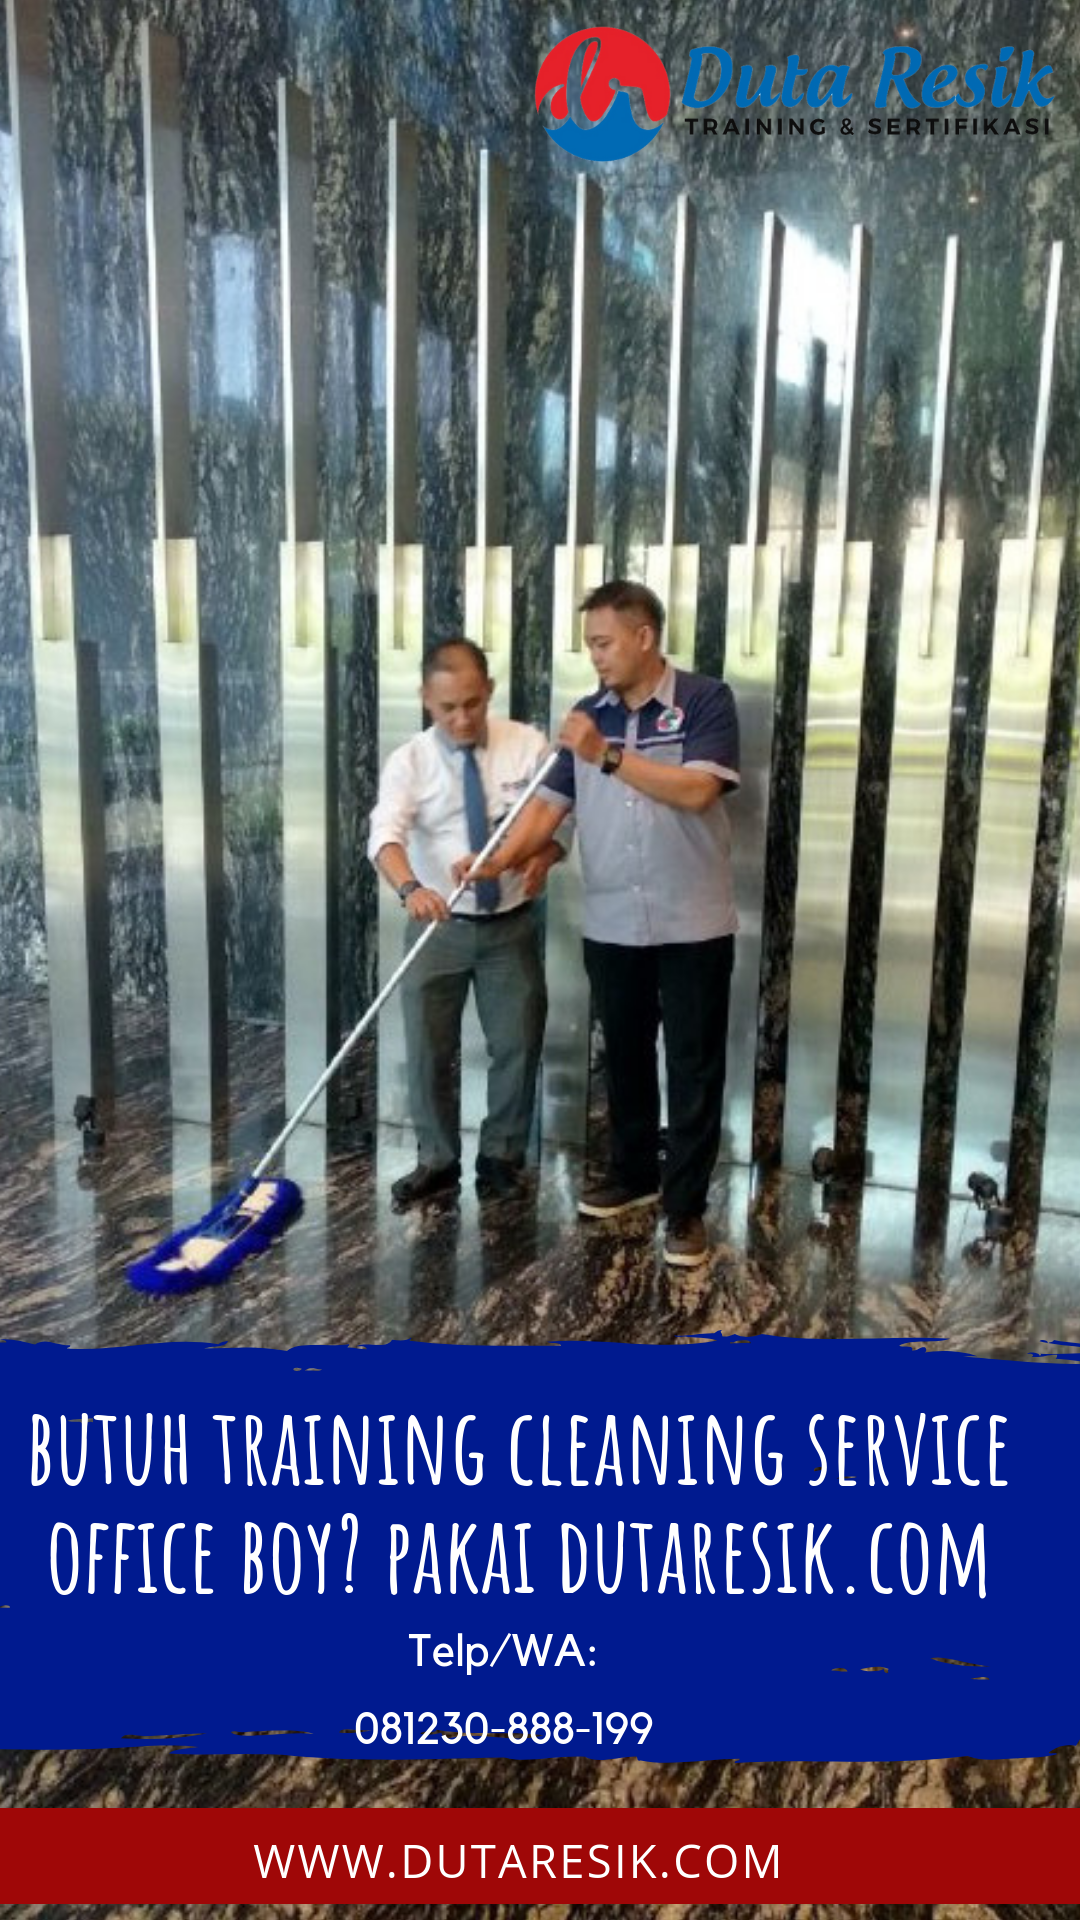 Jasa Trainin Cleaning Service Office Boy Latihan, Indonesia